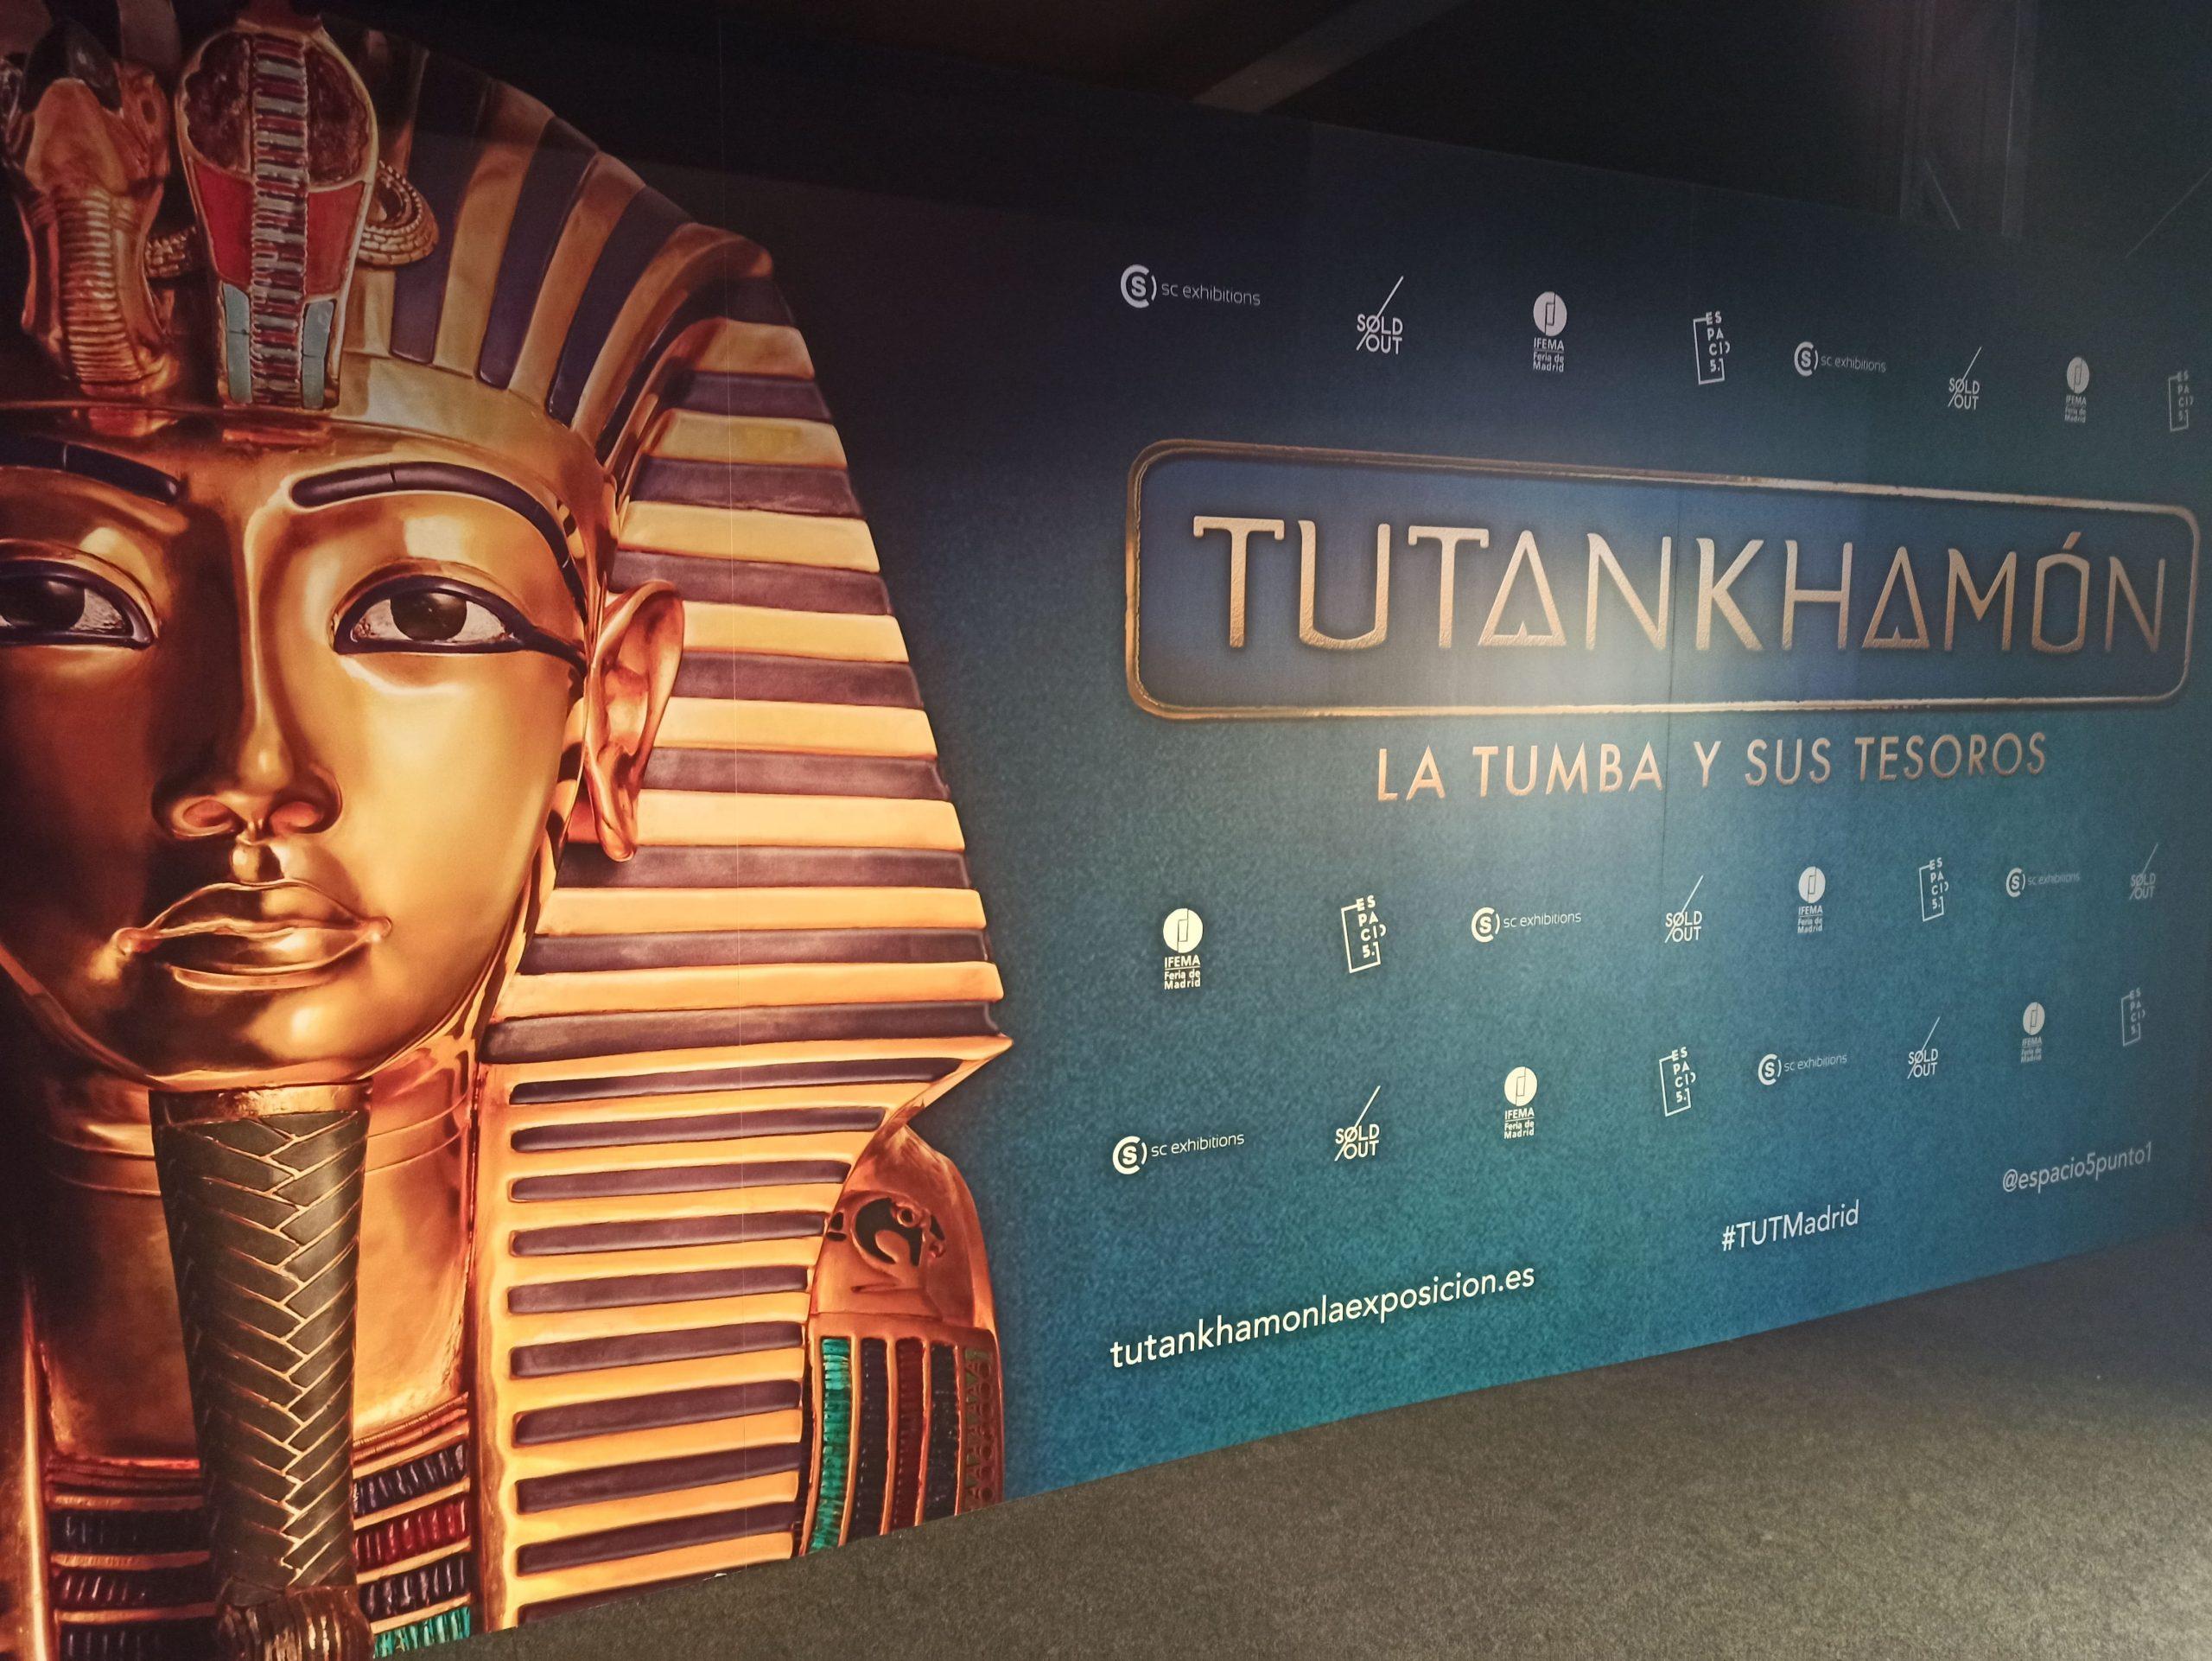 Tutankhamon tumba y tesoros en Ifema Madrid